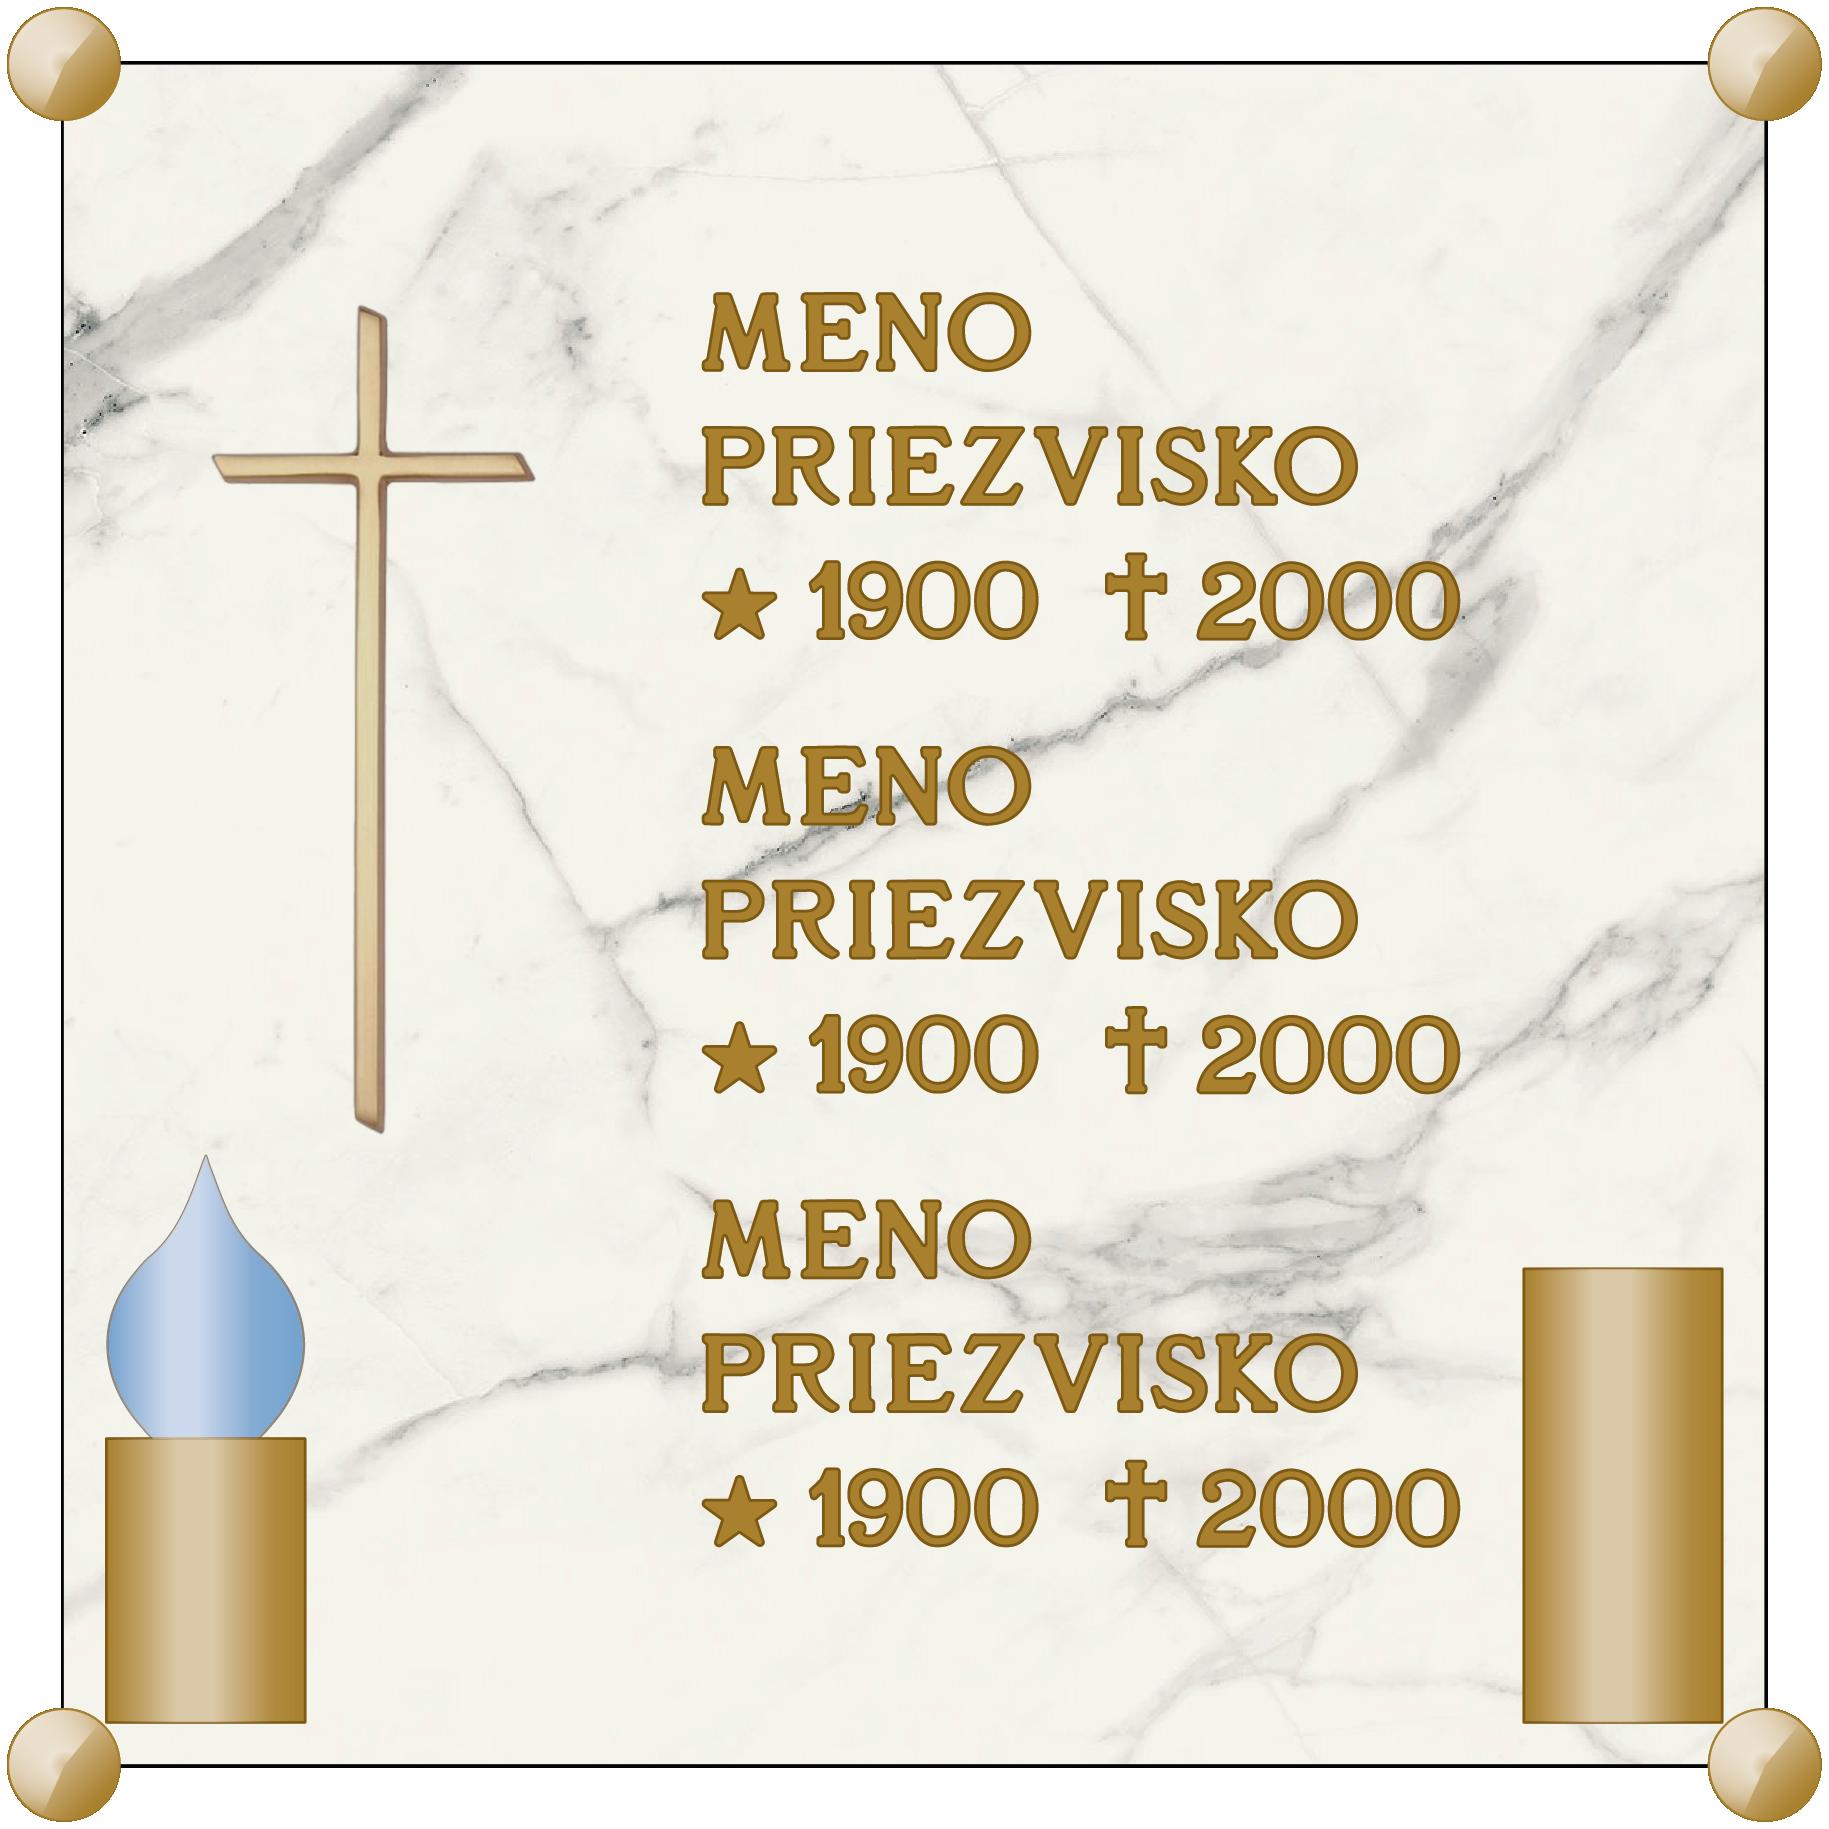 ROMANO_60x60_60x60_2b